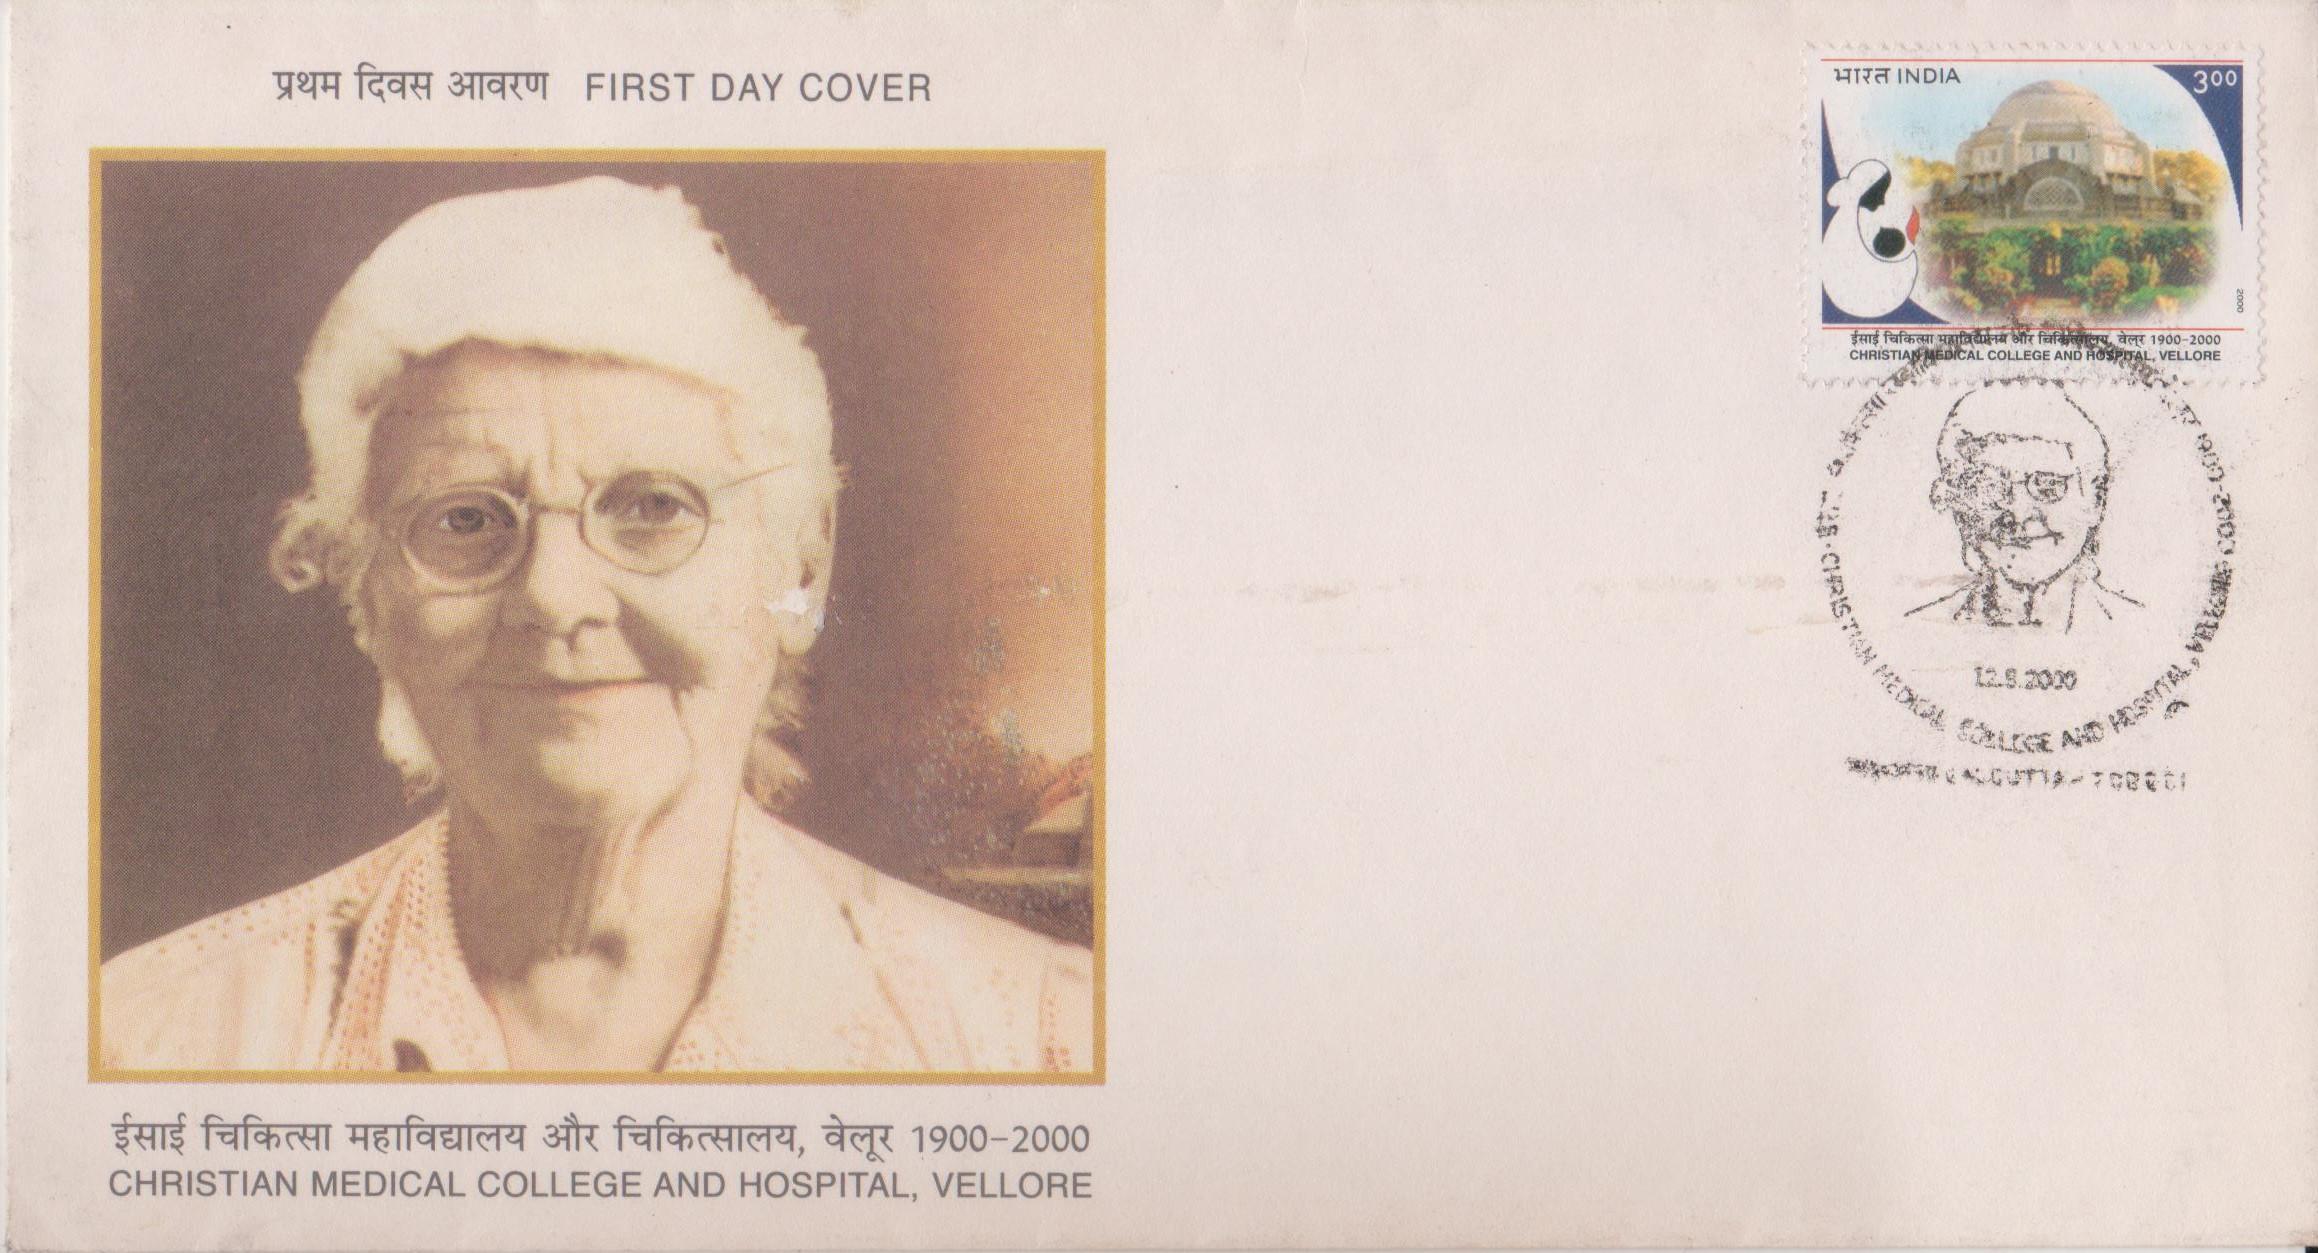 Dr. Ida Sophia Scudder : American medical missionary in India